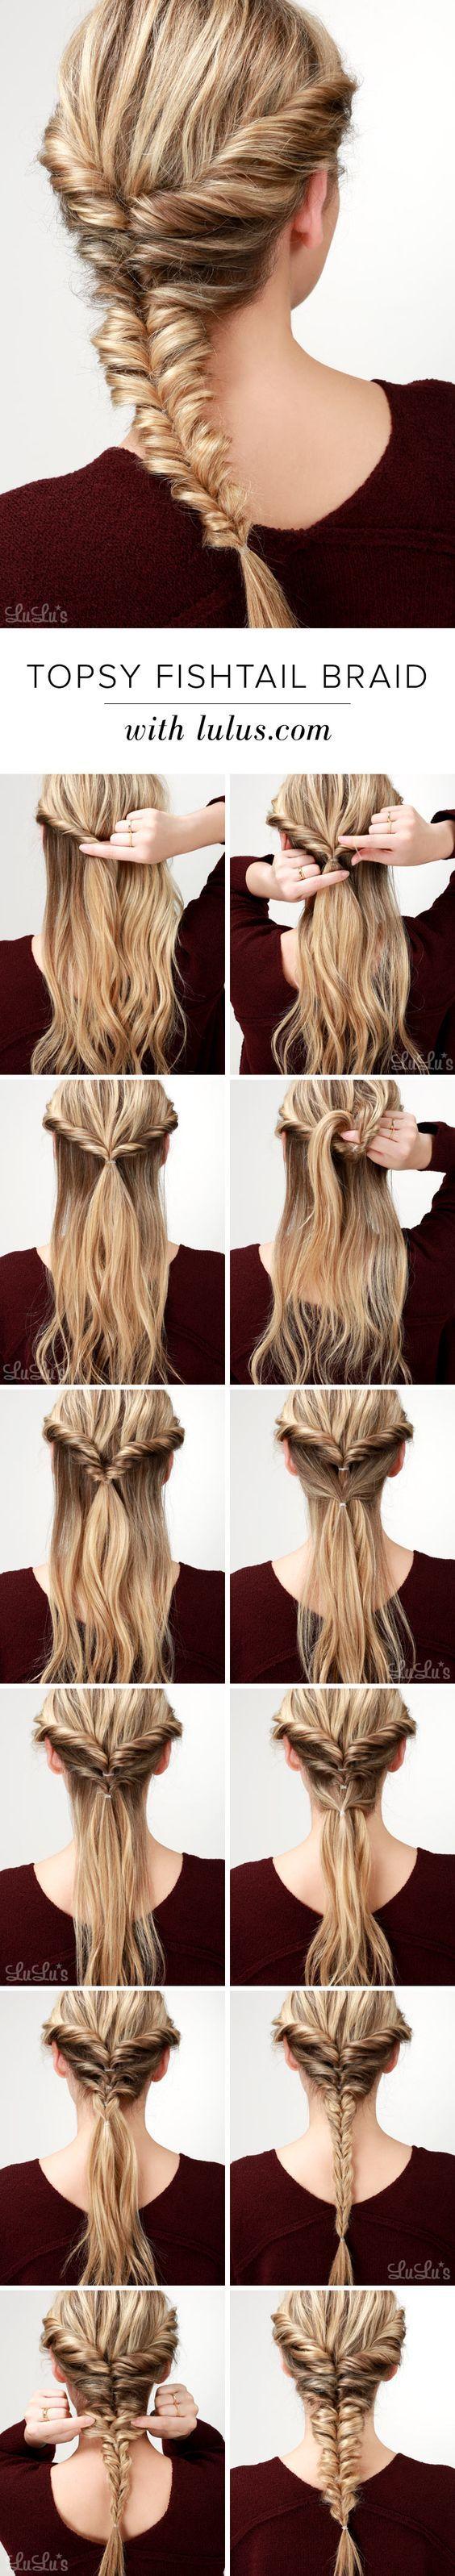 best braided hairstyles that turn heads braid hairstyles th